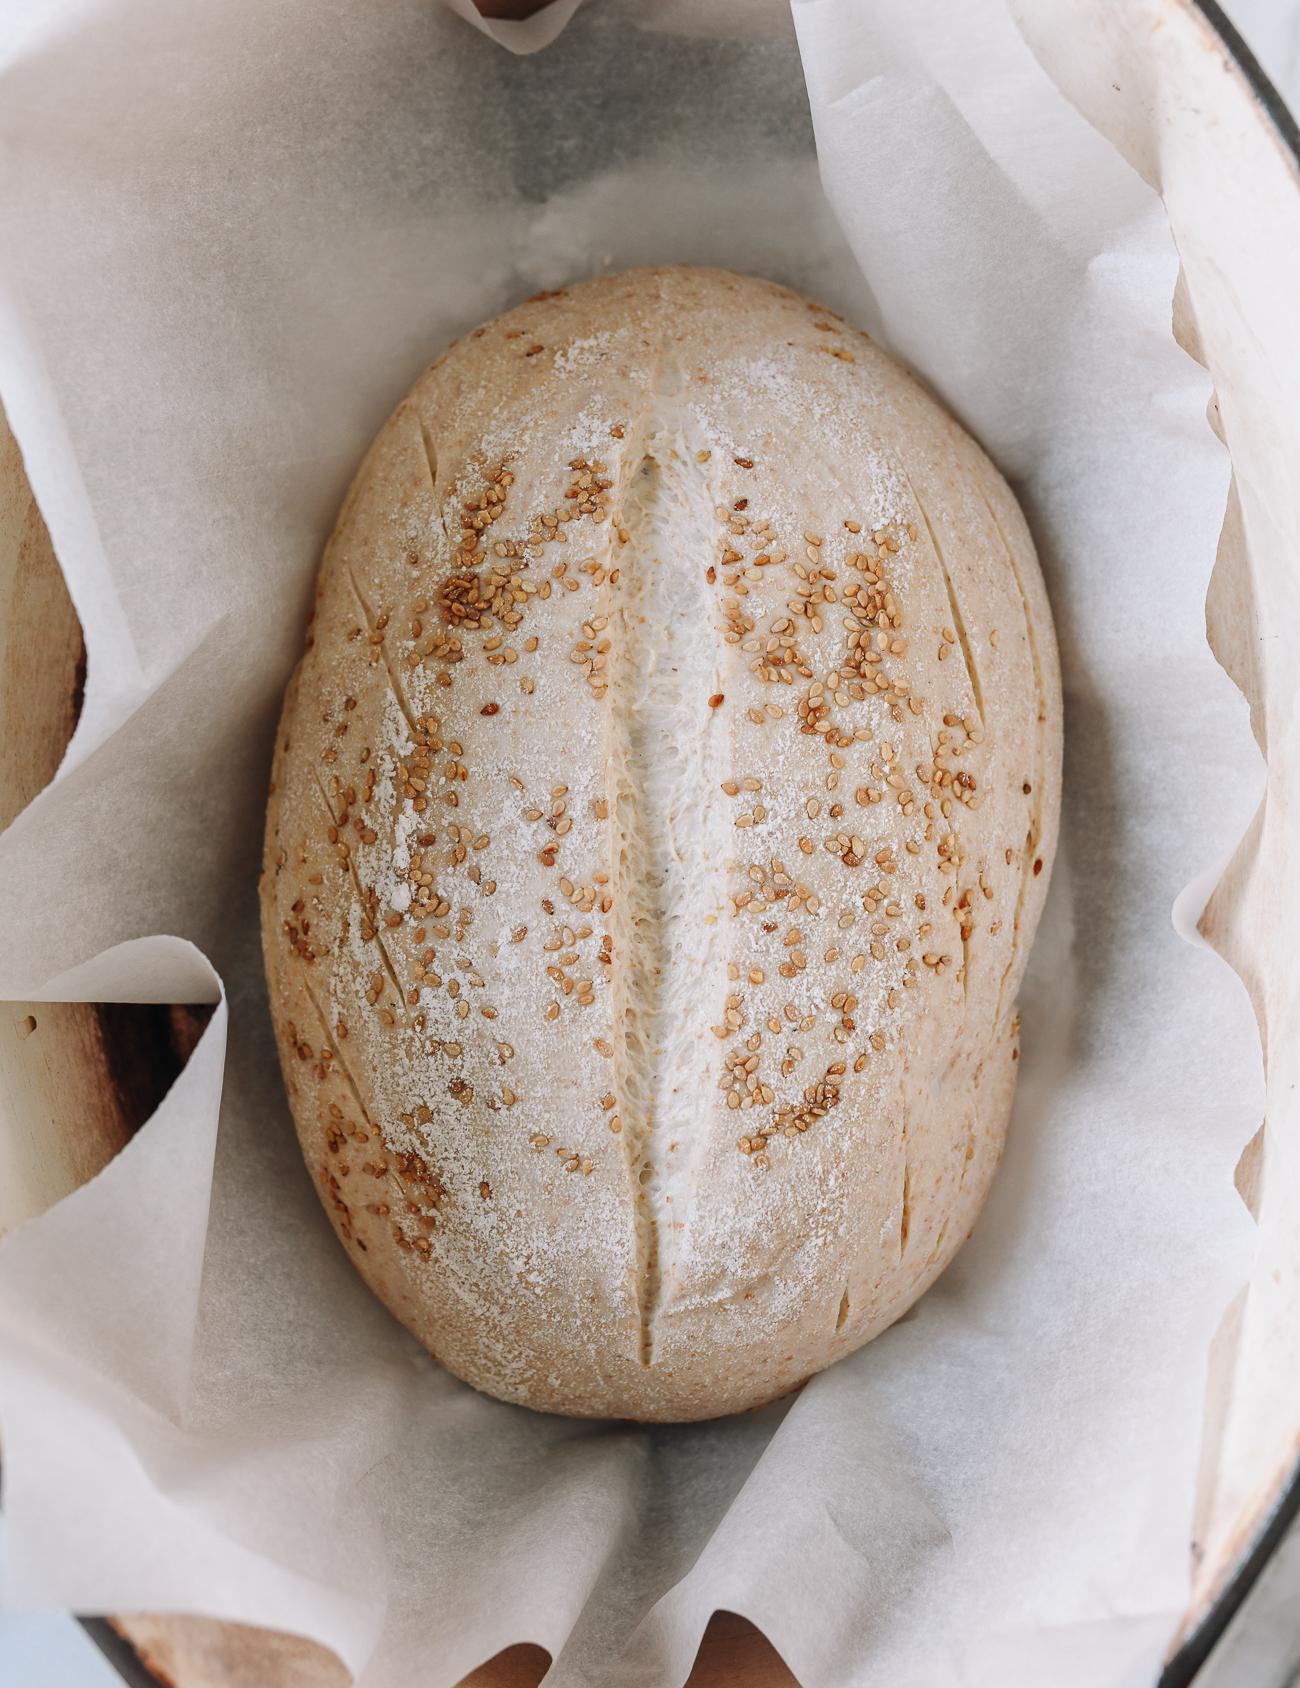 Loaf sitting in hot Dutch oven